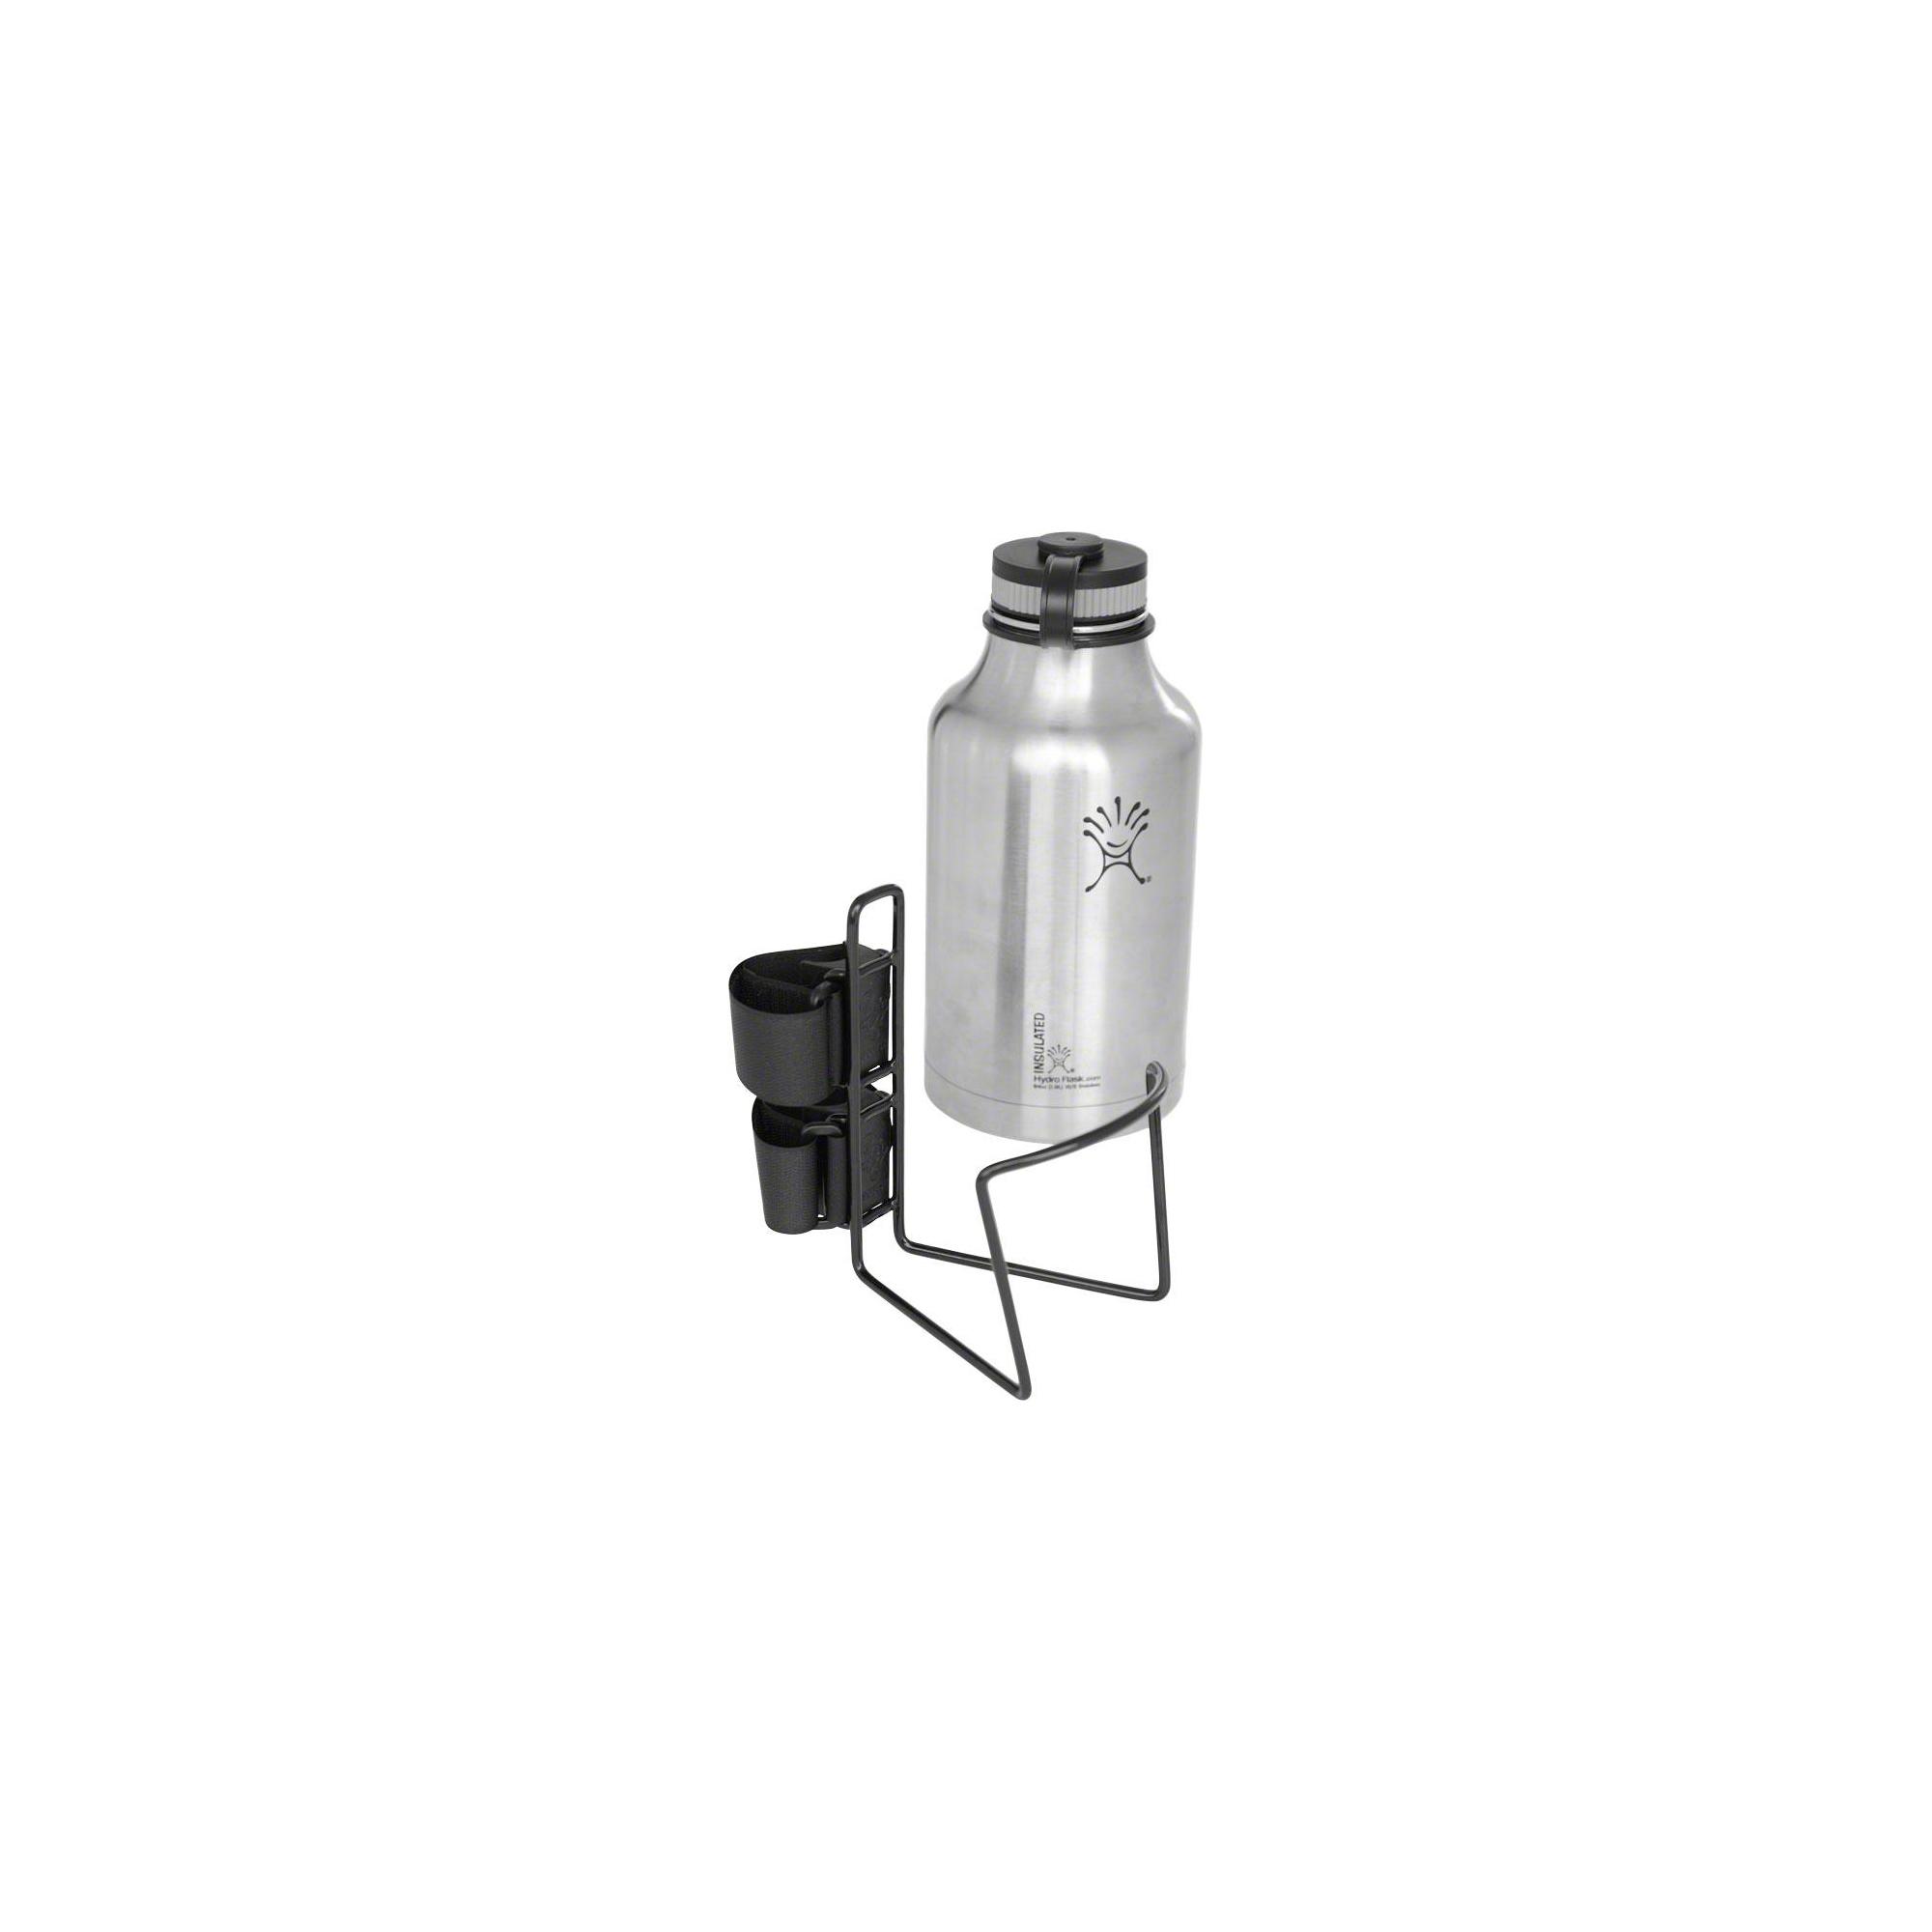 "TwoFish Growler QuickCage 64oz Water Bottle Cage: 5.0"" Bottle Vinyl Coated Black"